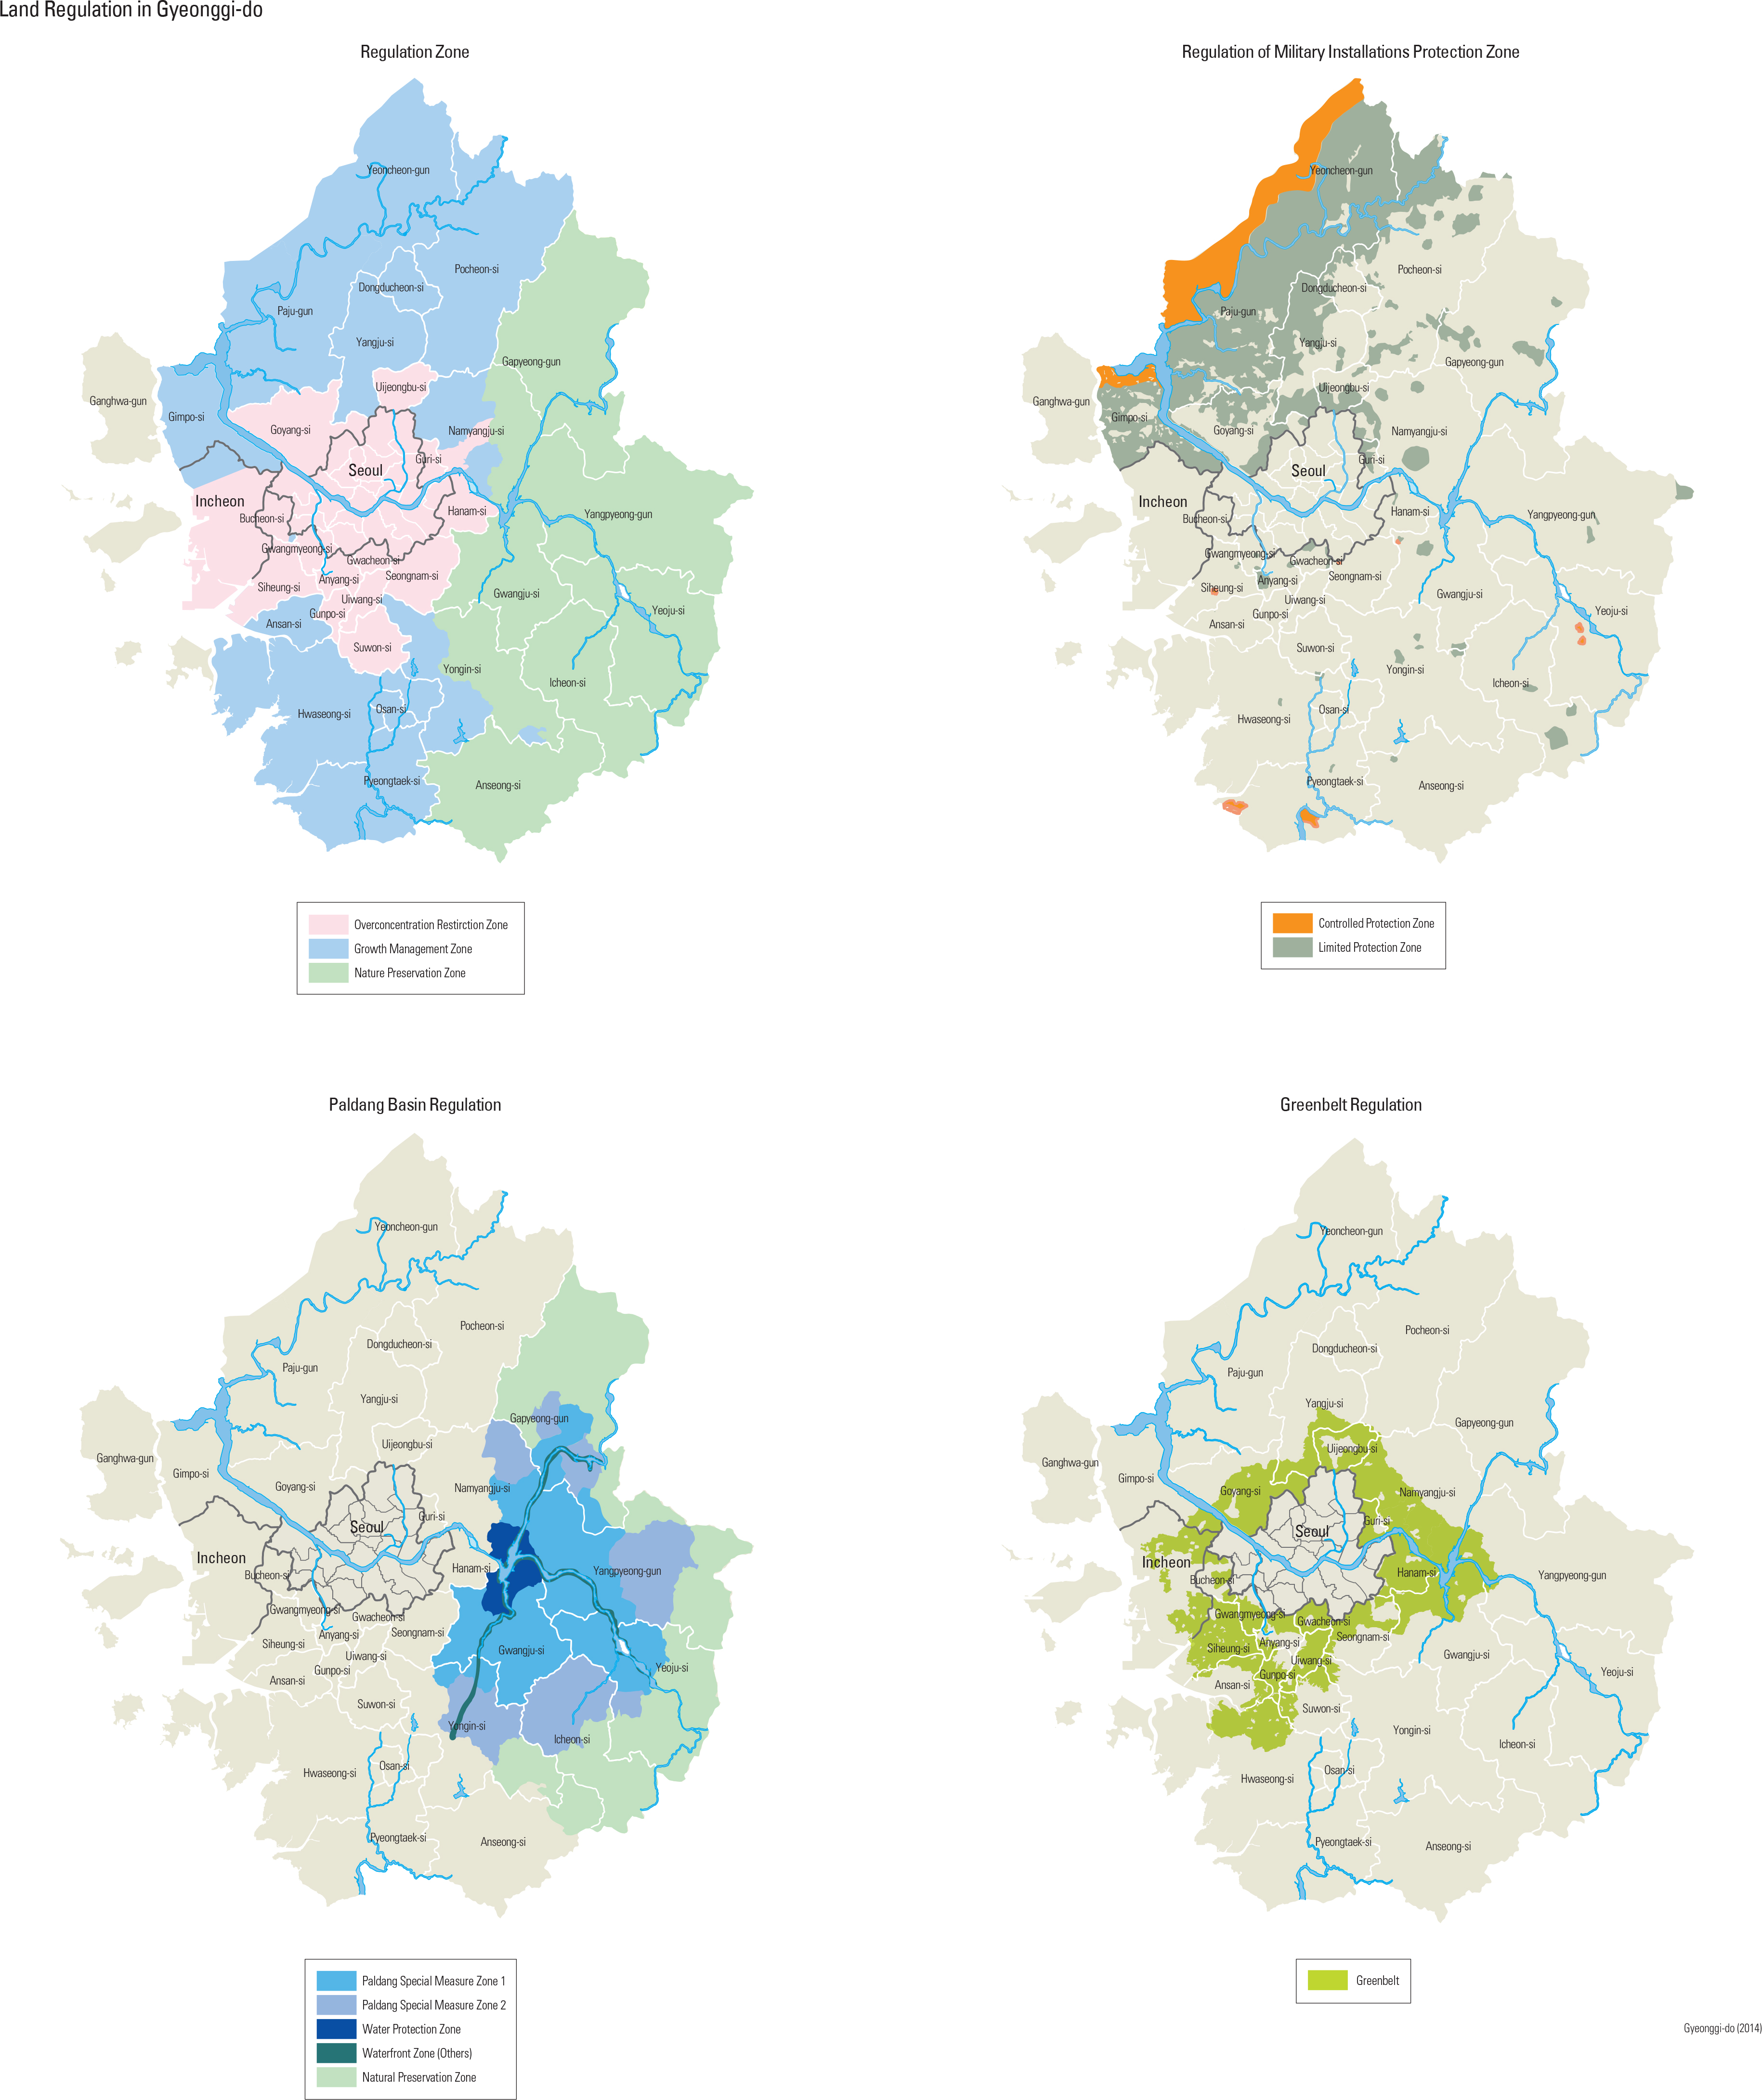 Land Regulation in Gyeonggi-do